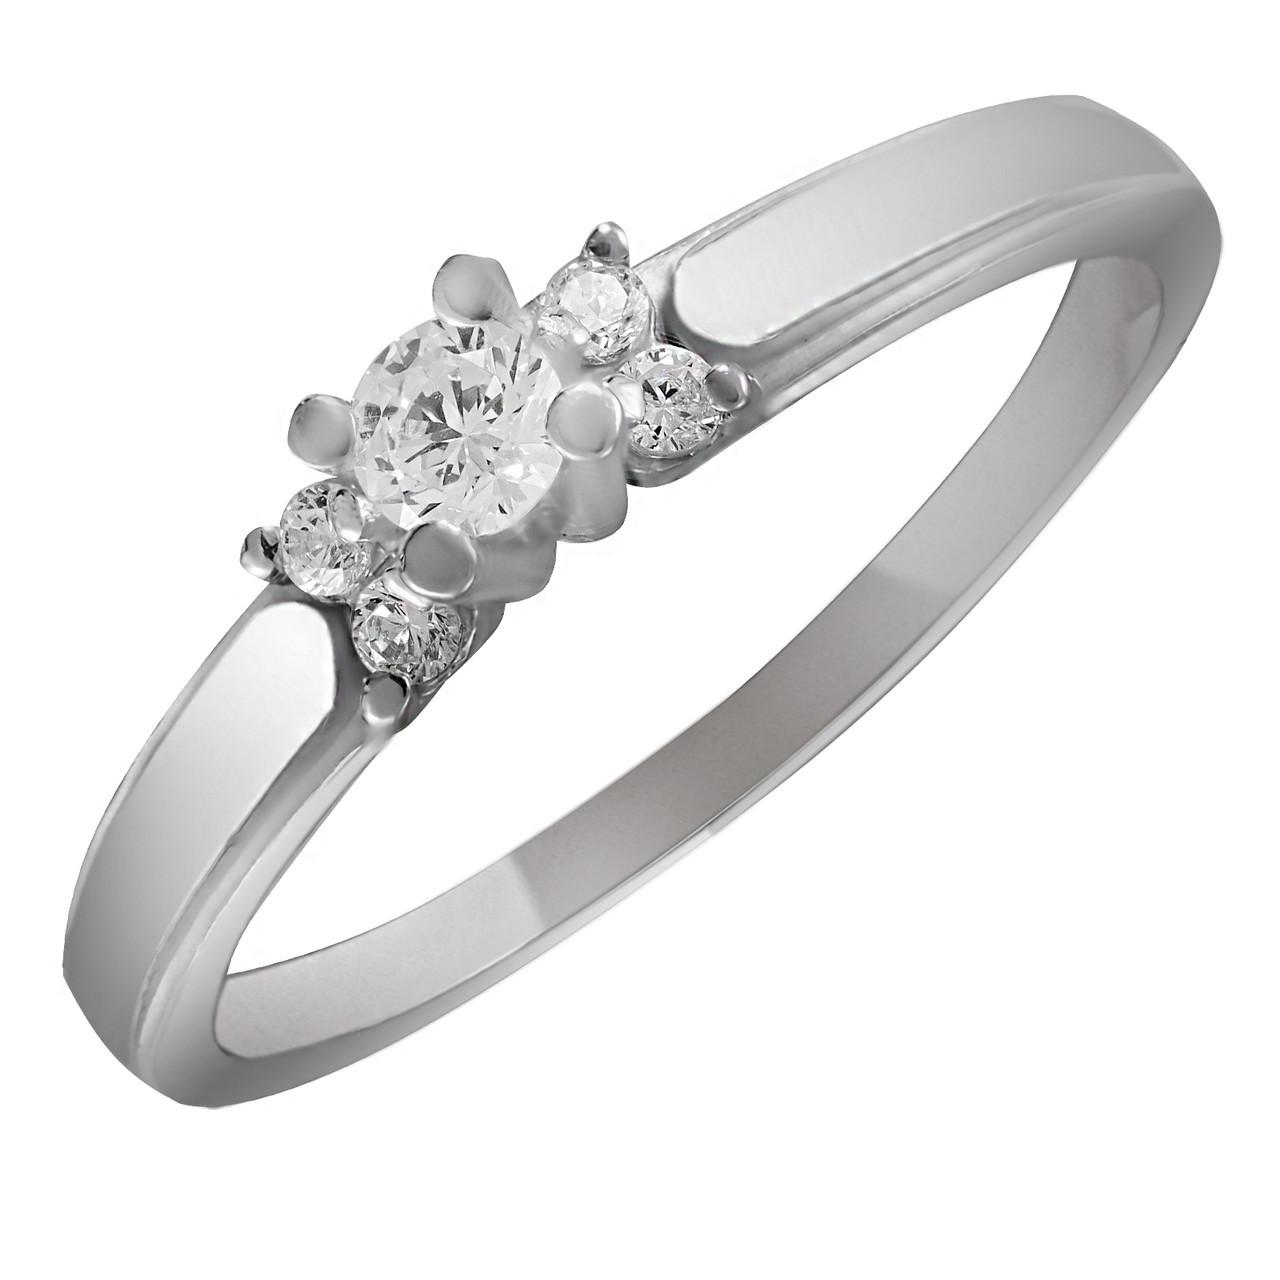 Кольцо из серебра с куб. циркониями Twiddle Jewelry 16.0 размер (К012-16.0)